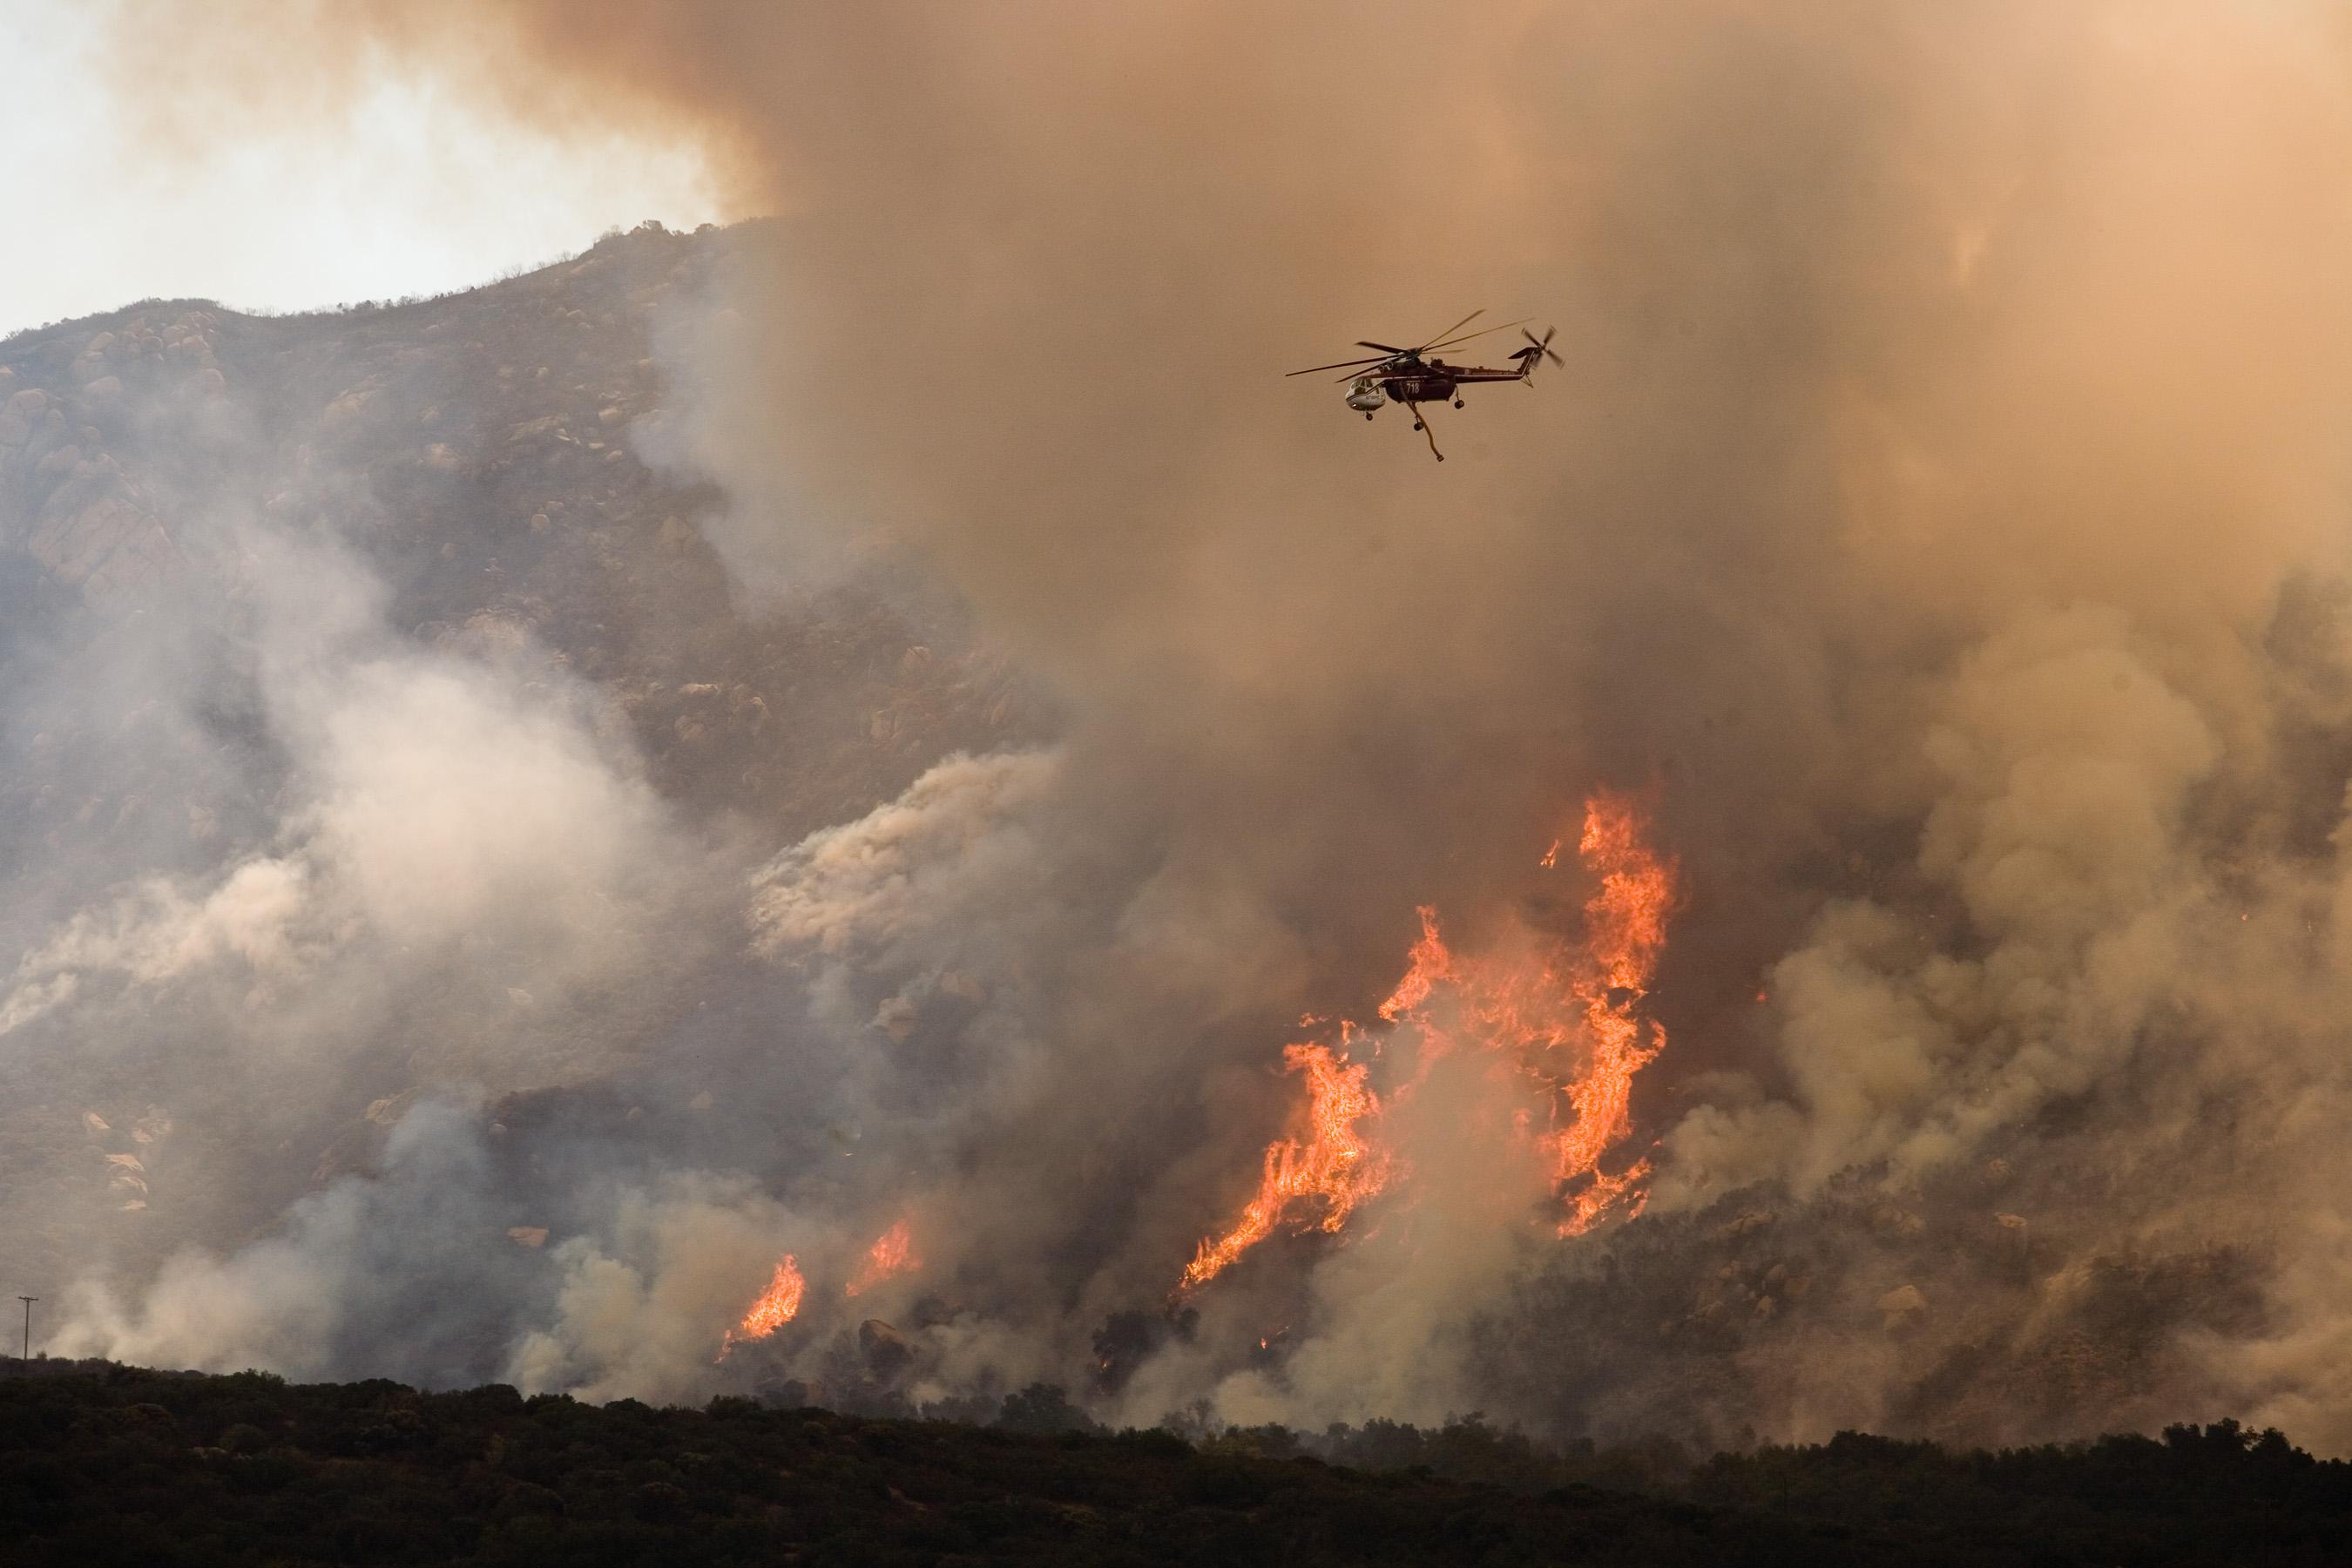 Photo: Andrea Booher/FEMA